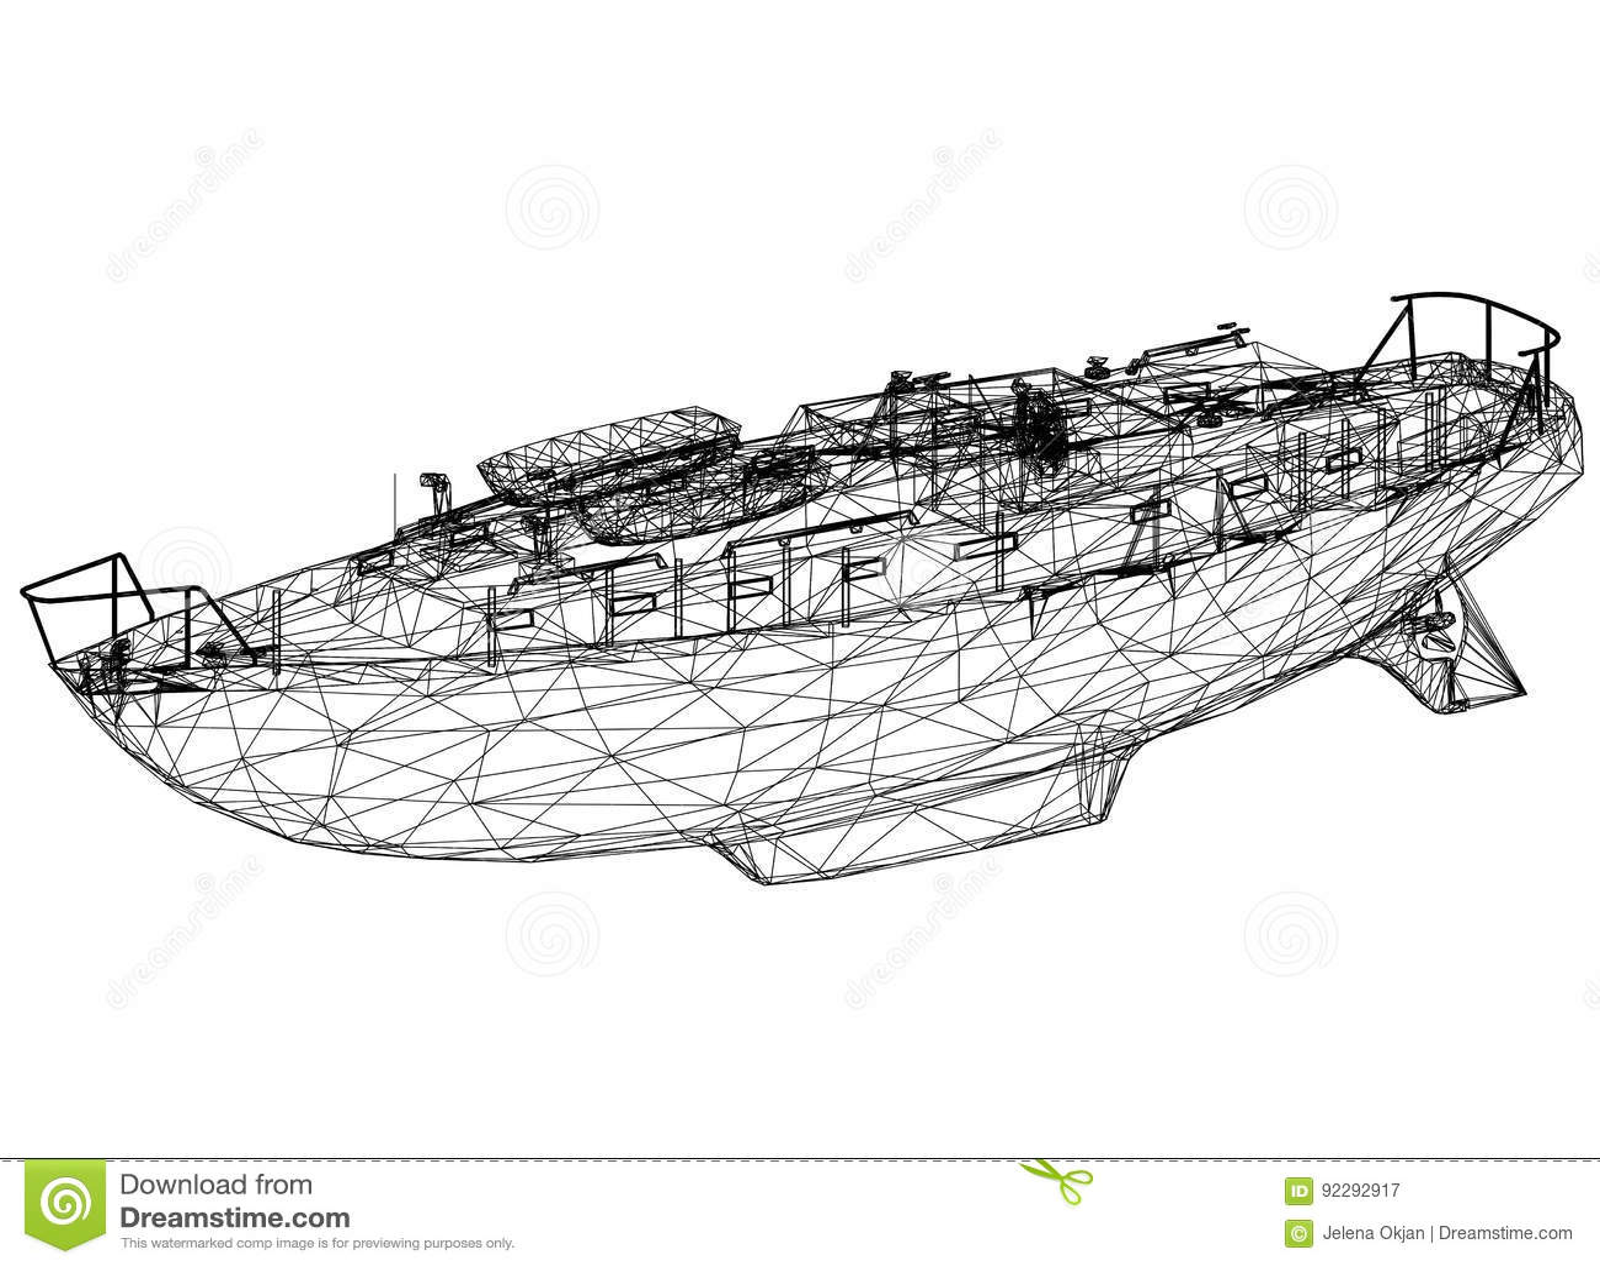 Boat blueprint – 3D perspective